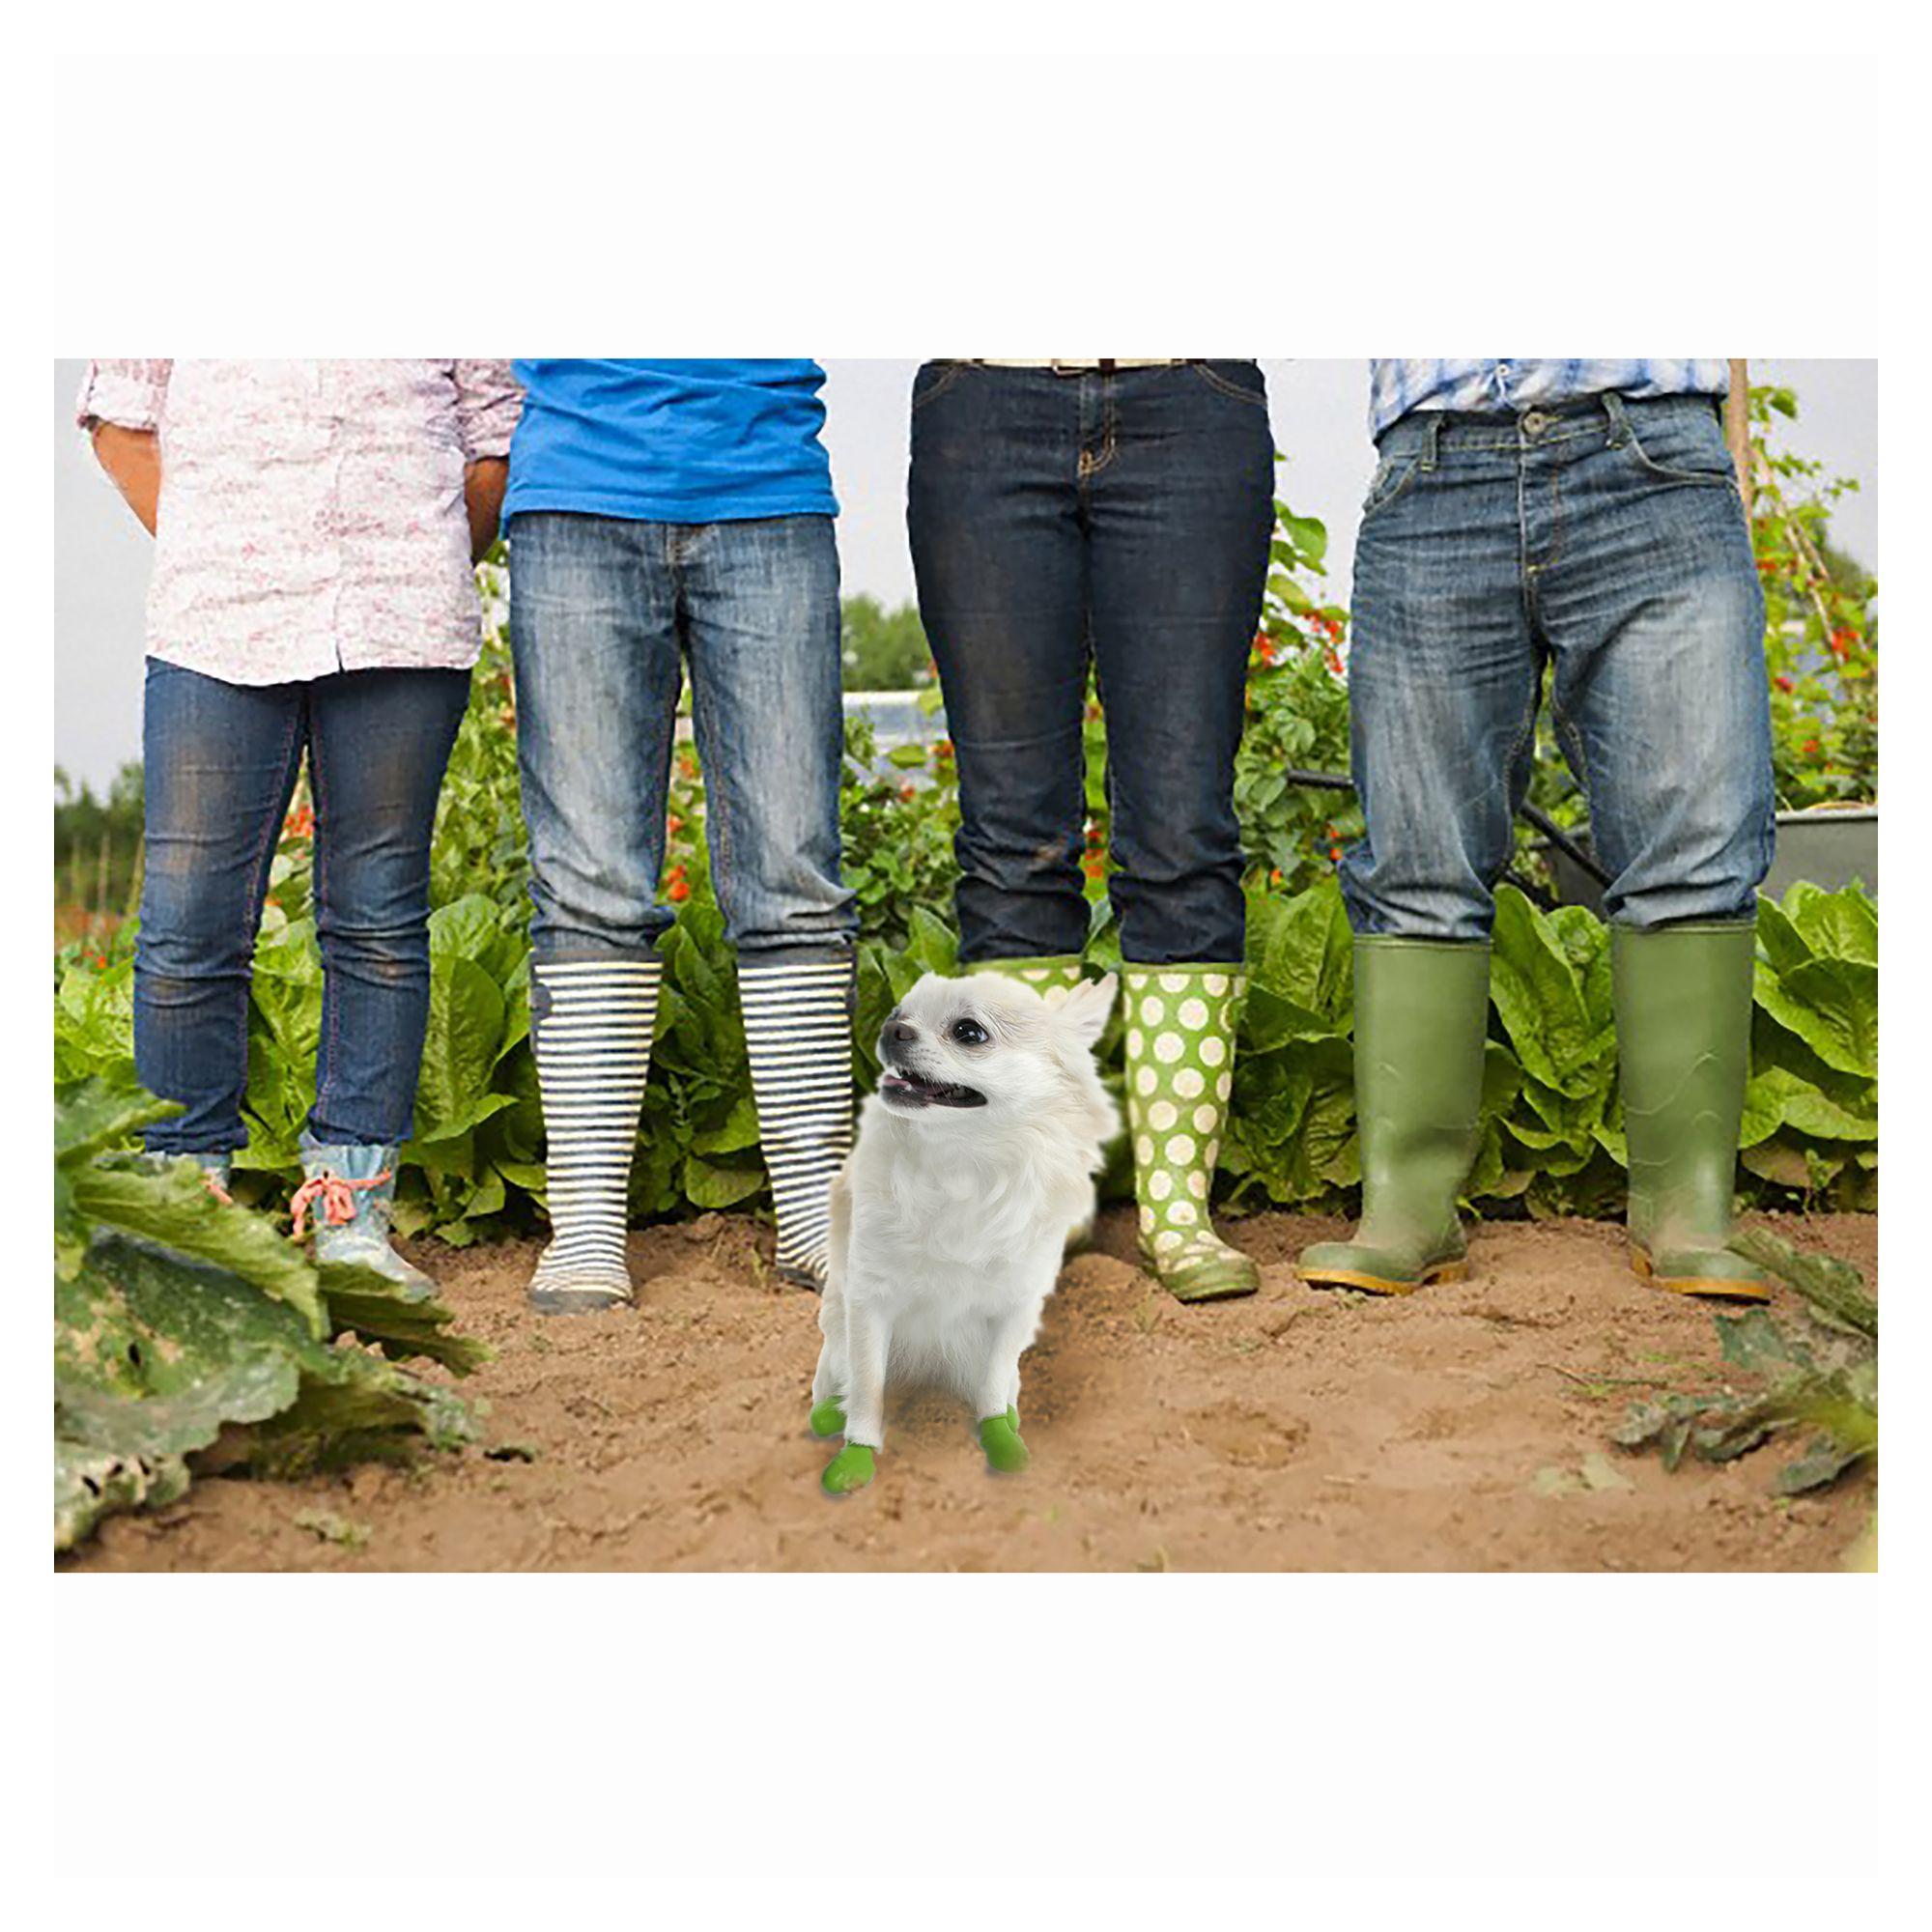 Pawz Rubber Dog Boots Shoes